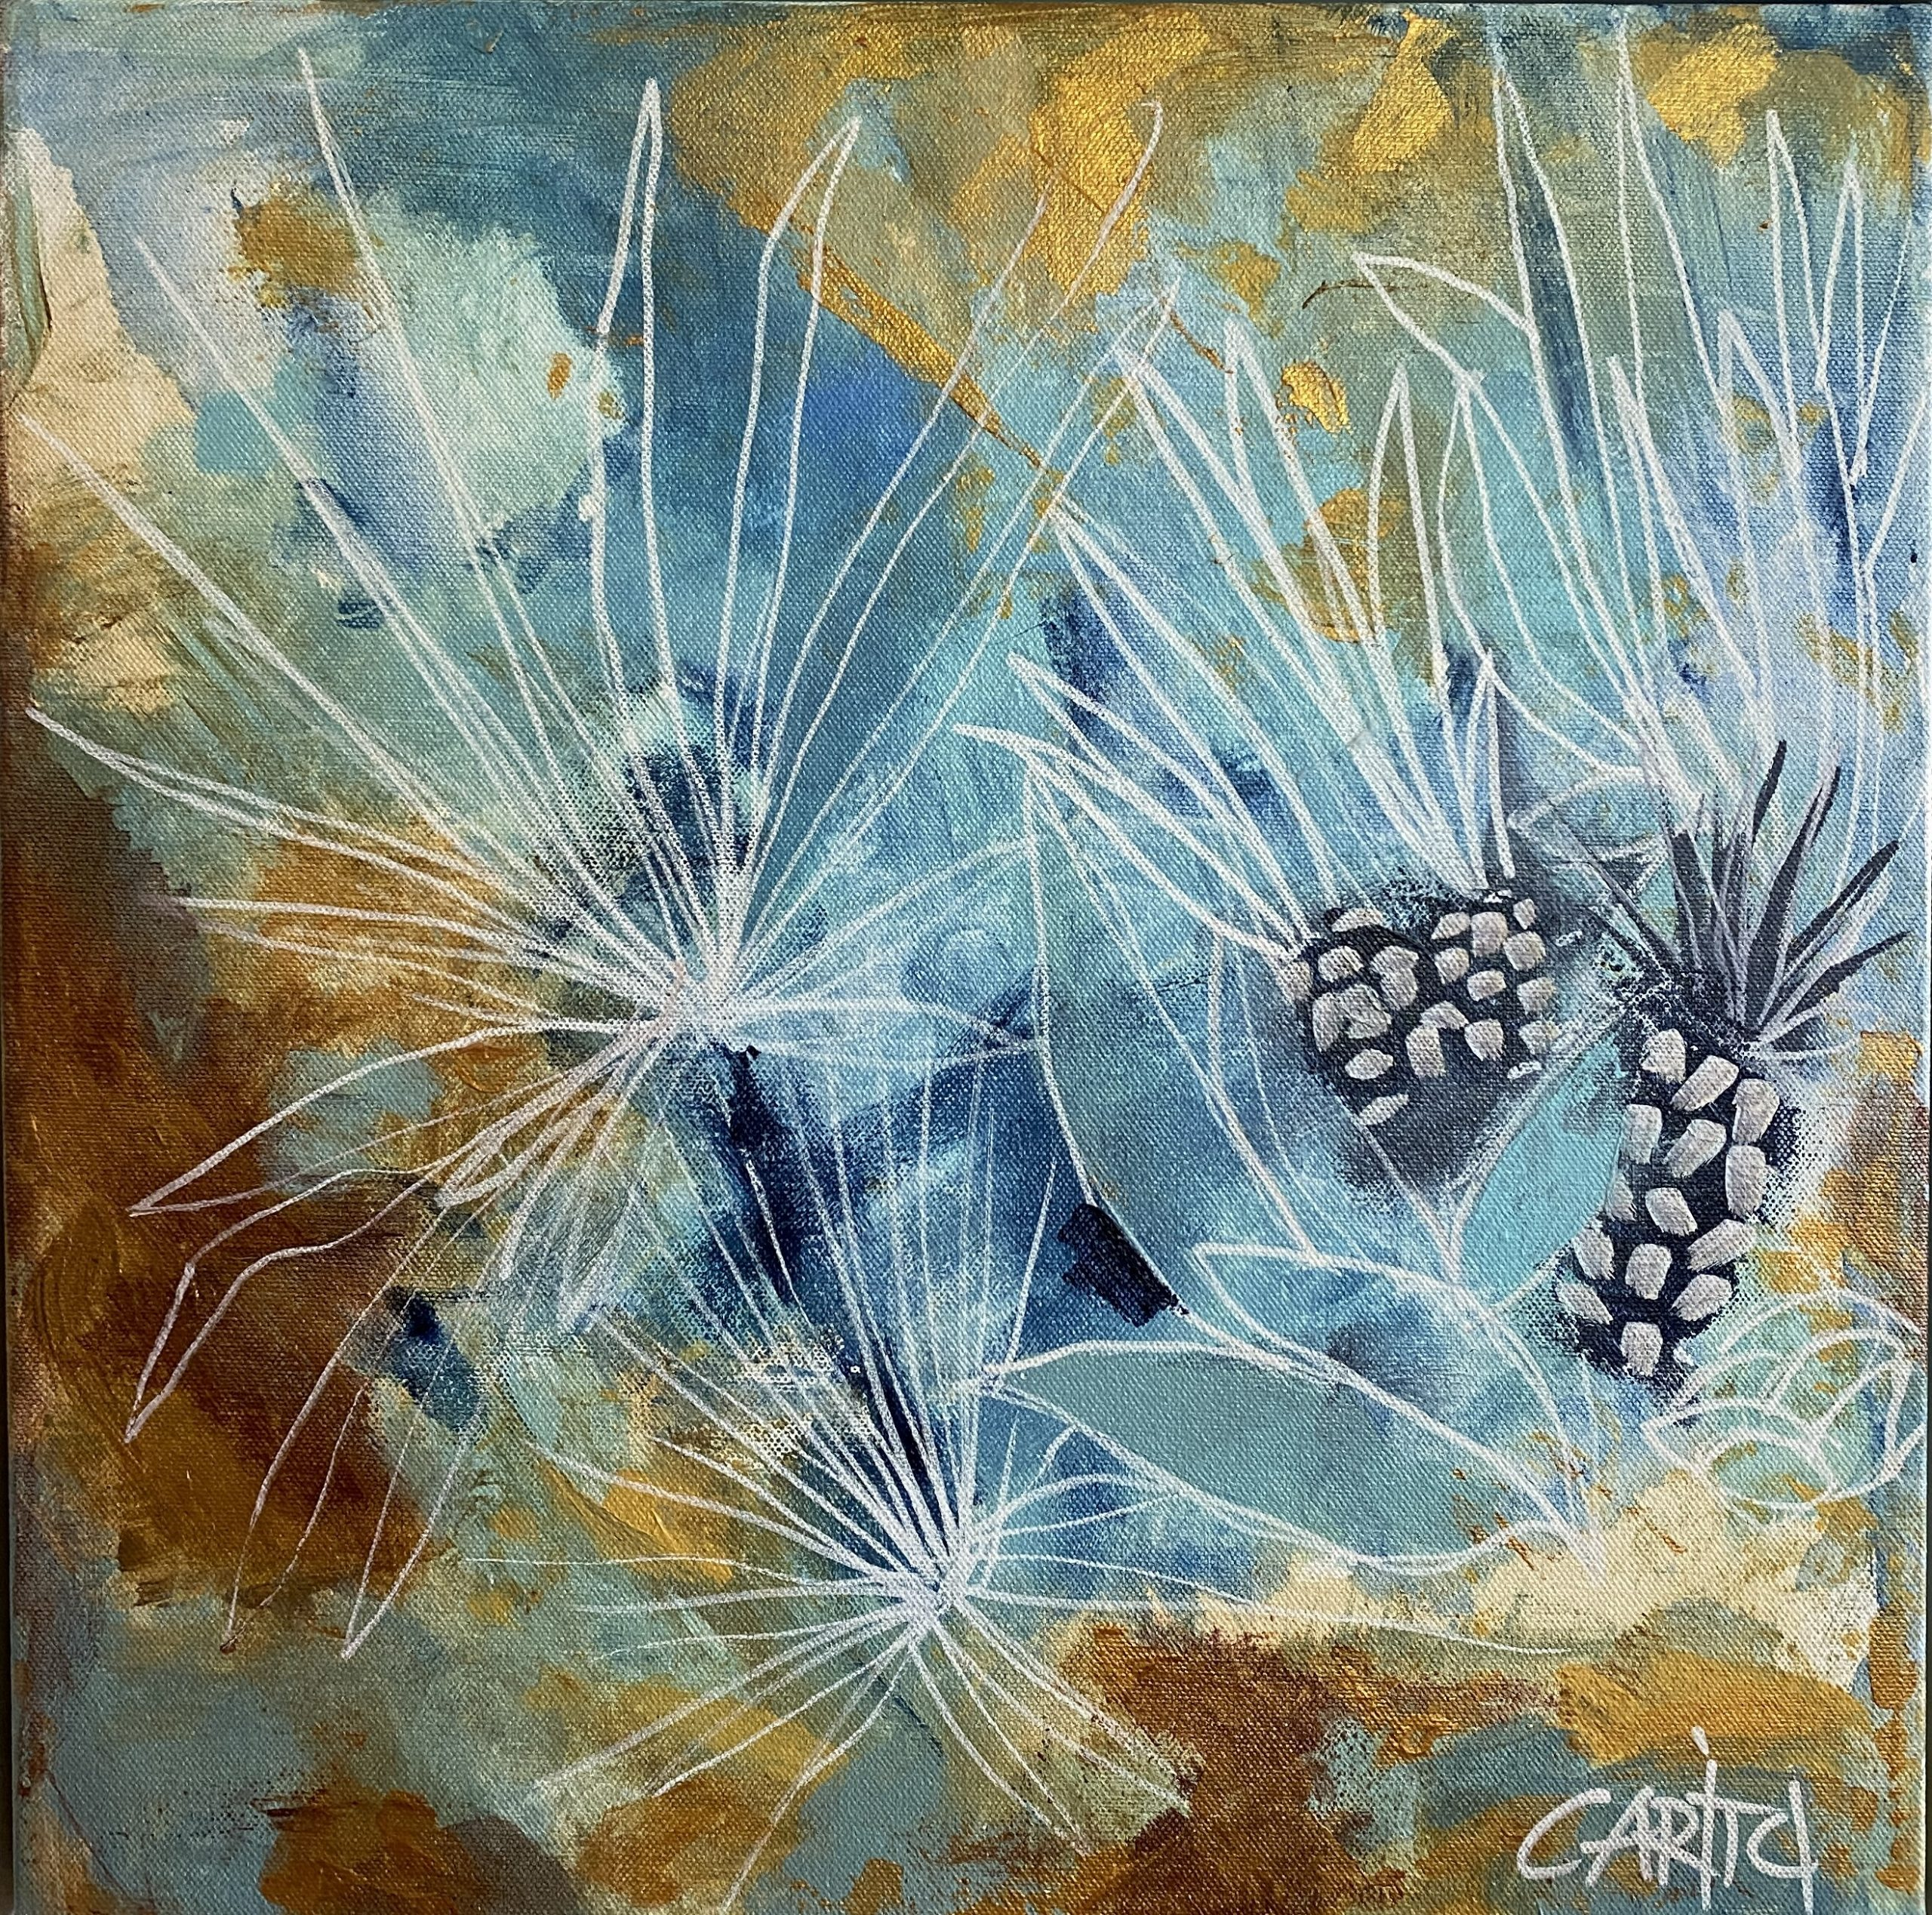 Carita Farrer Spencer Un Poco Agave 40x40cm Acrylic On Canvas